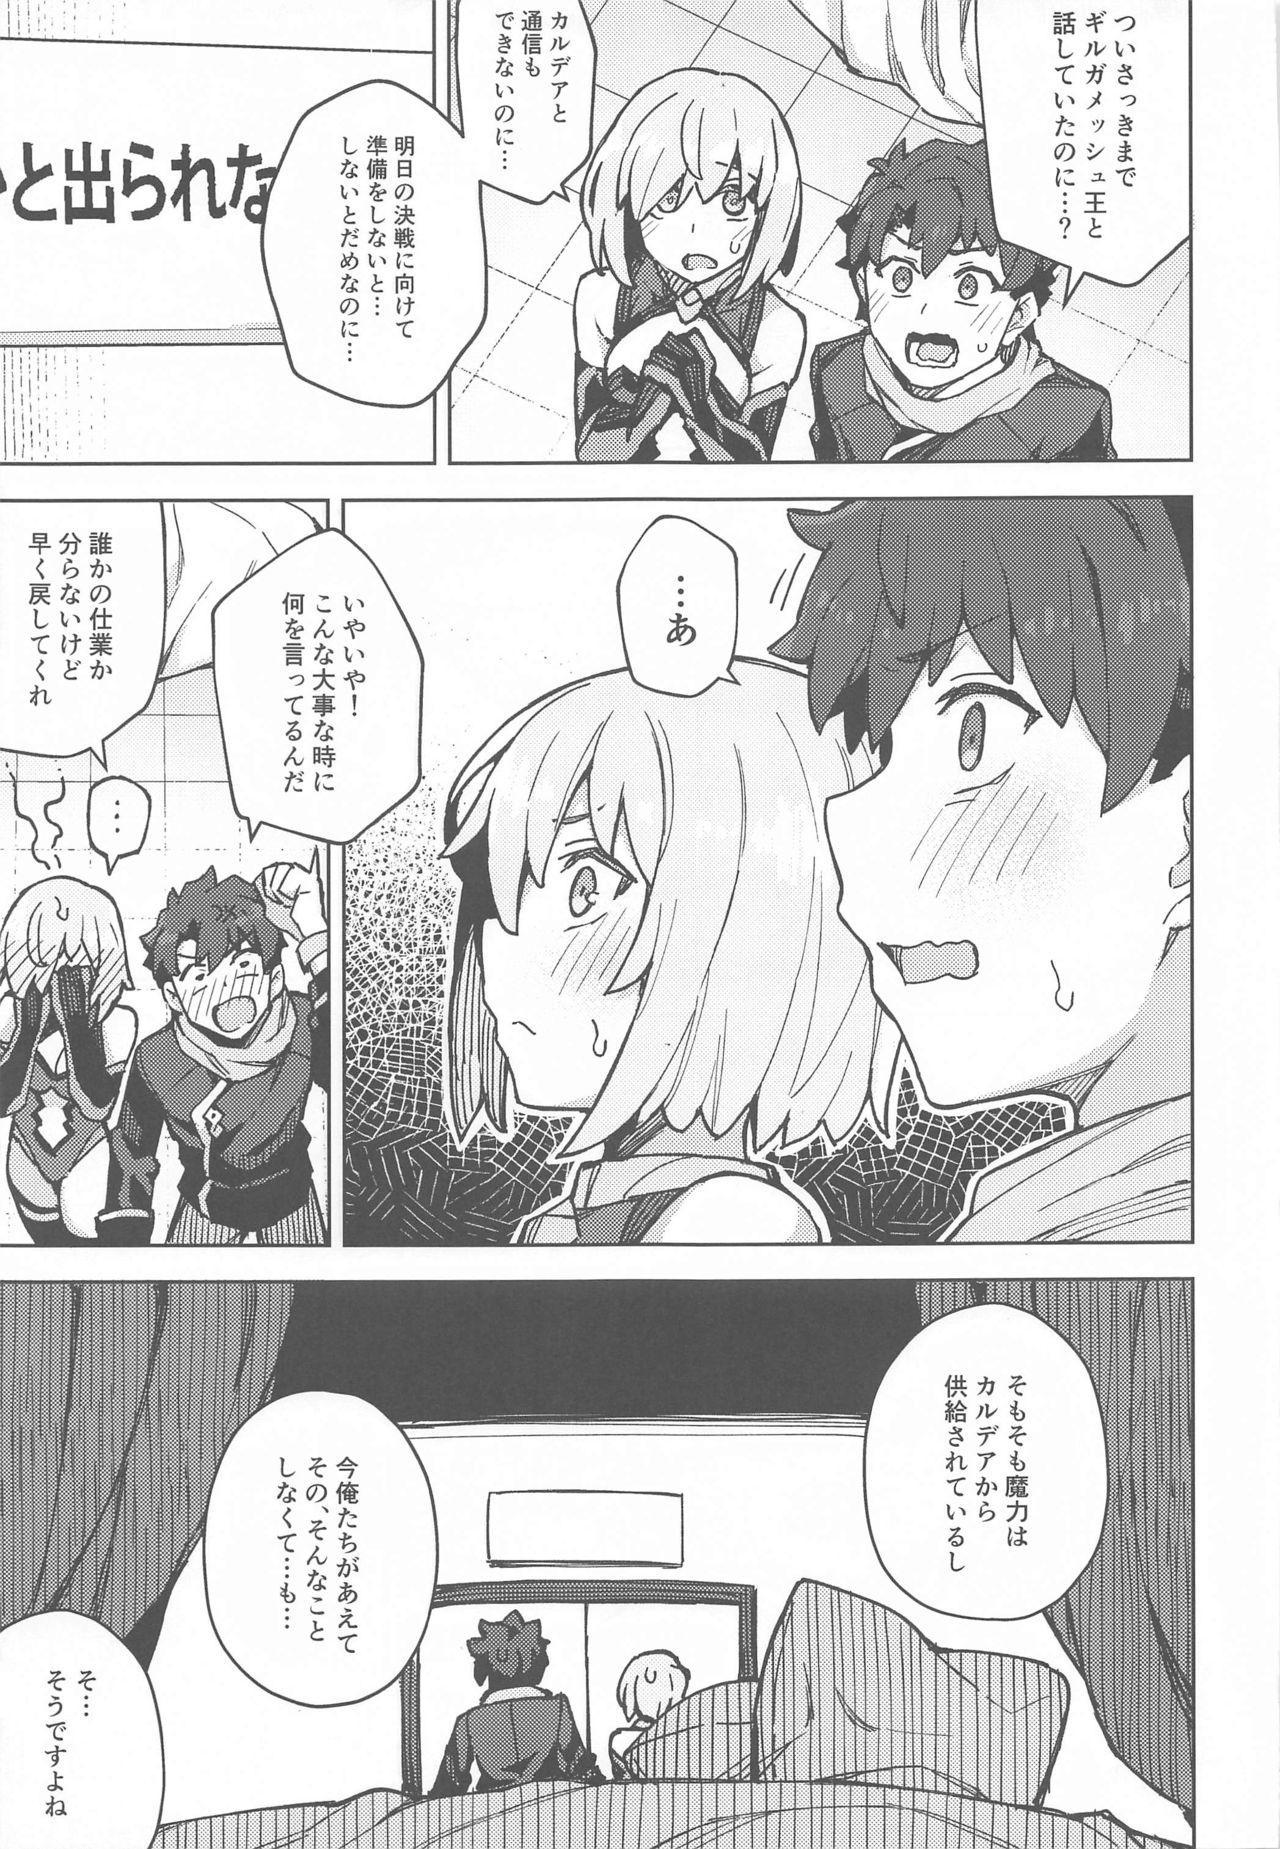 Da Megami Chuuihou 5